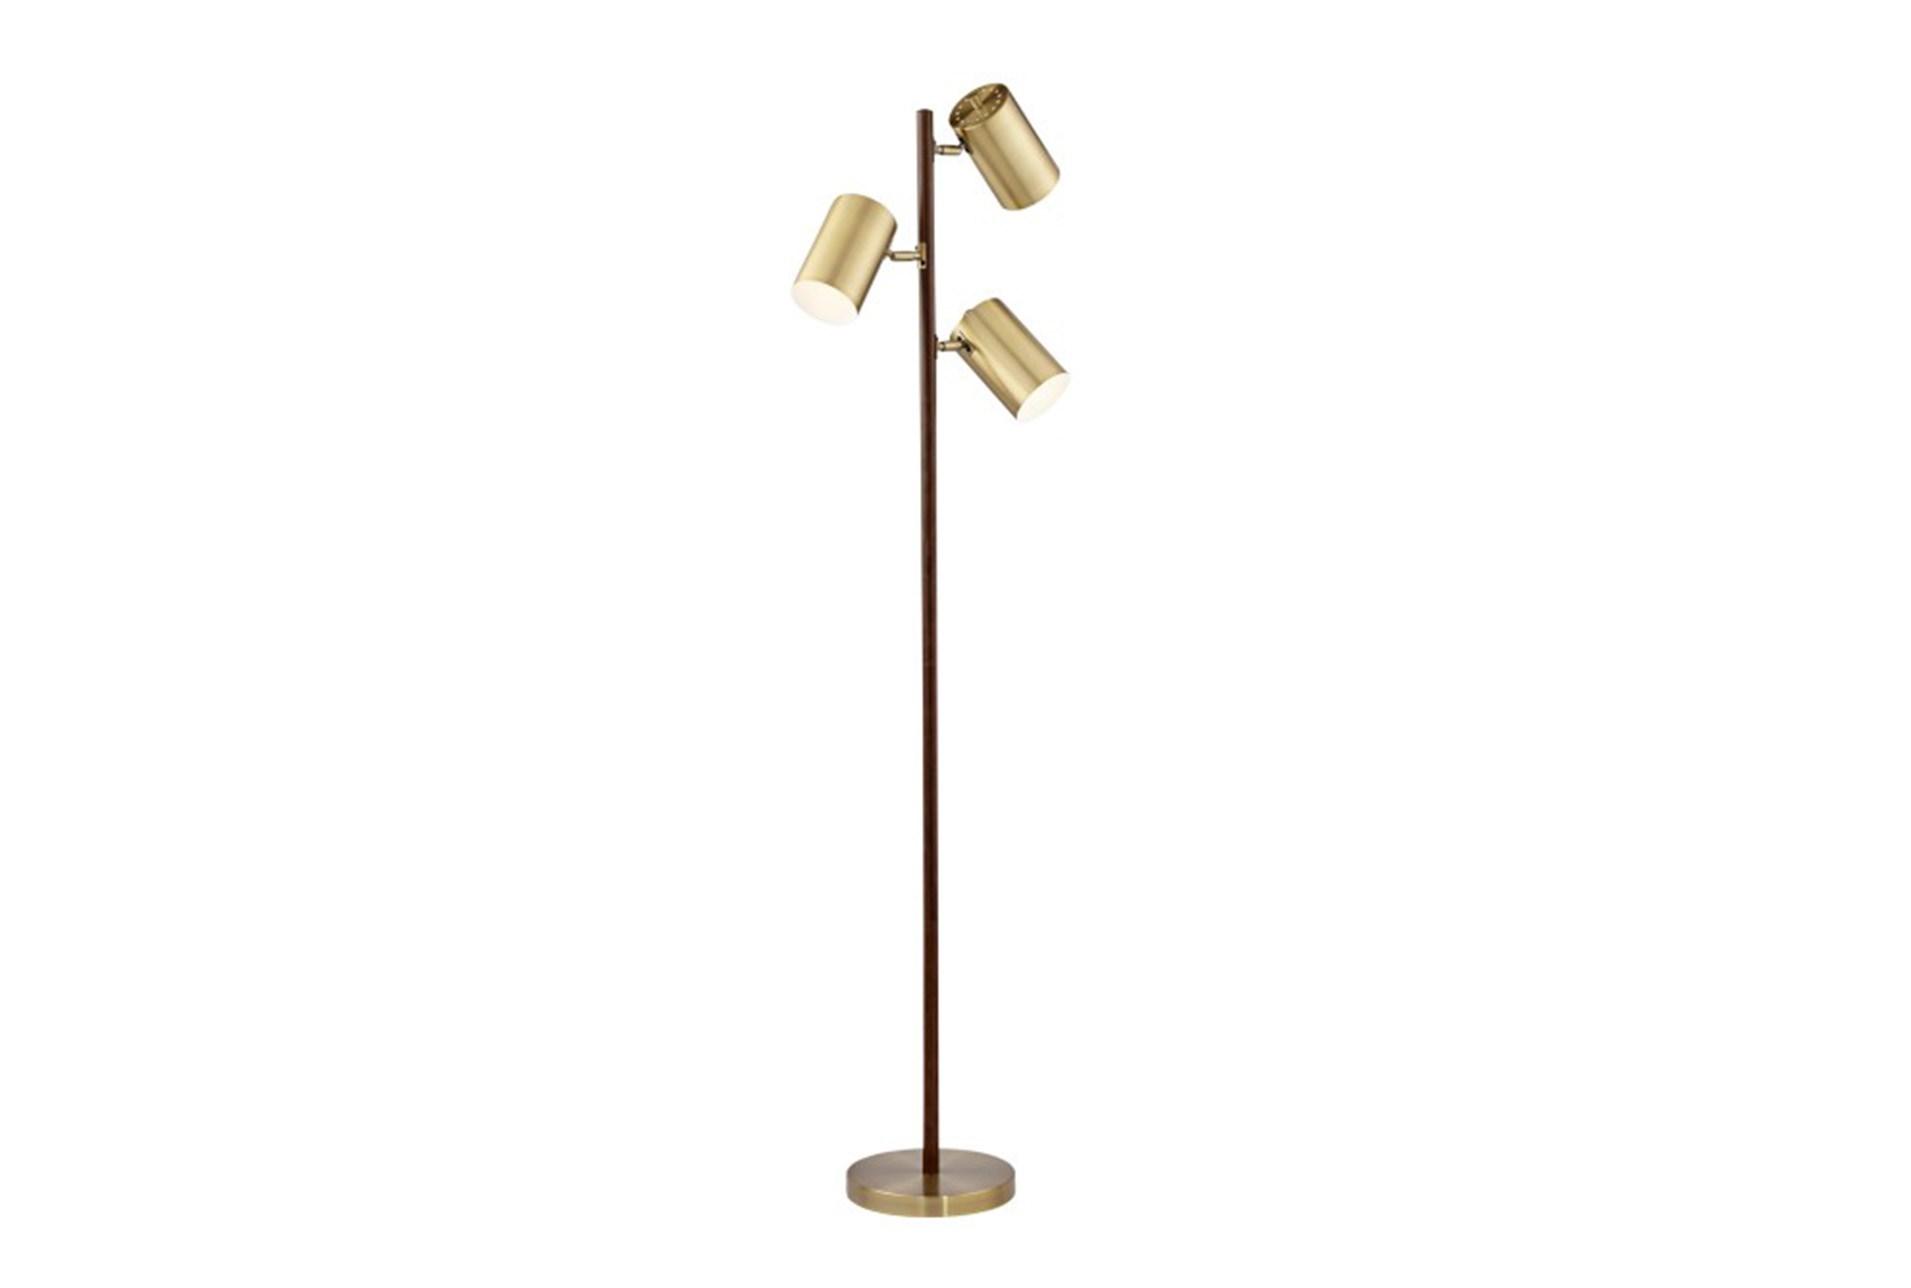 living spaces floor lamps marvellous floor lampwalnut brass 3light spotlight 360 living spaces